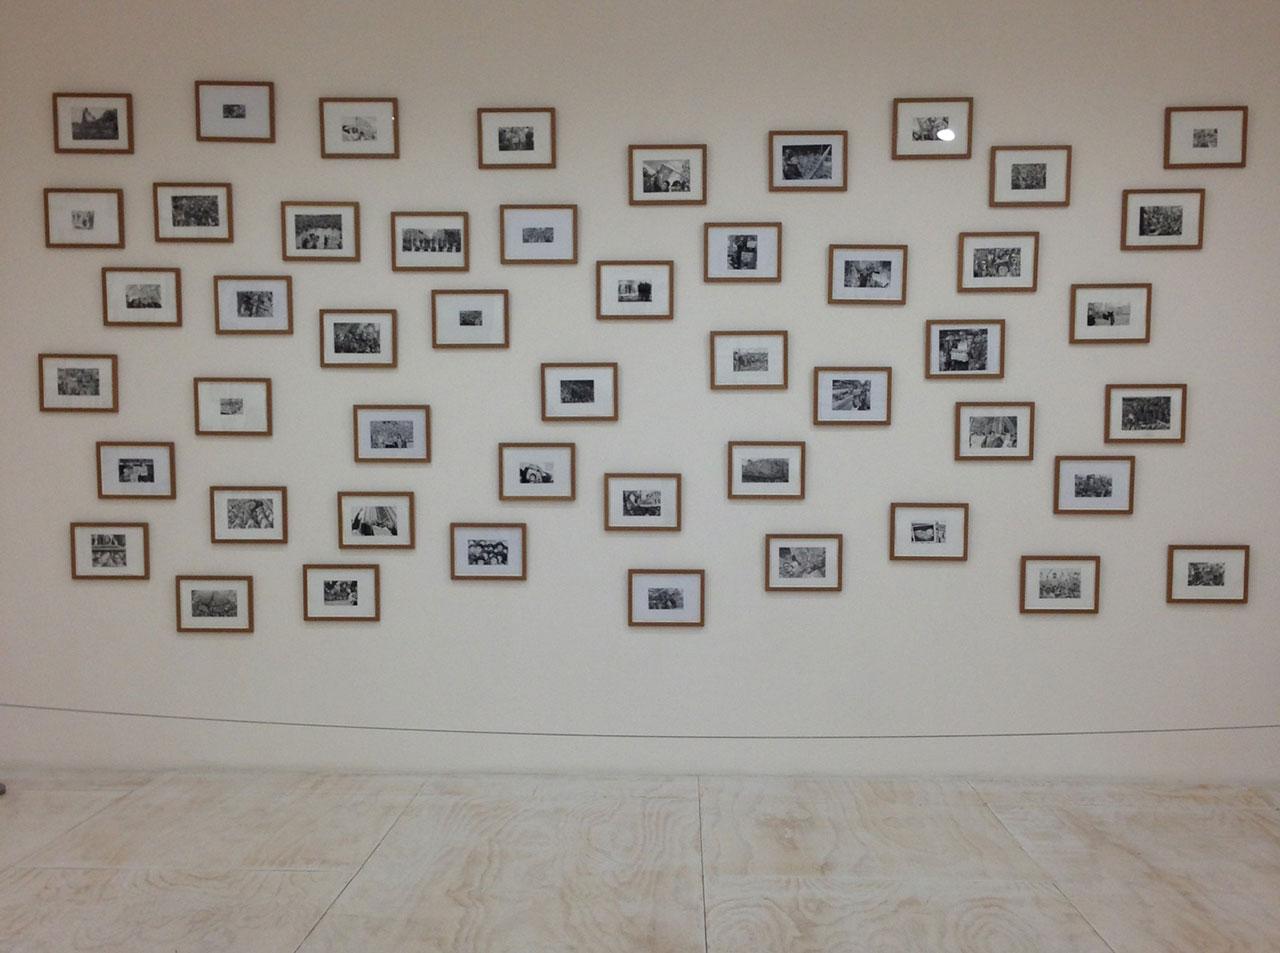 Installation view of Rikrit Tiravanija's 'Demonstration Drawings' (2009) (click to enlarge)